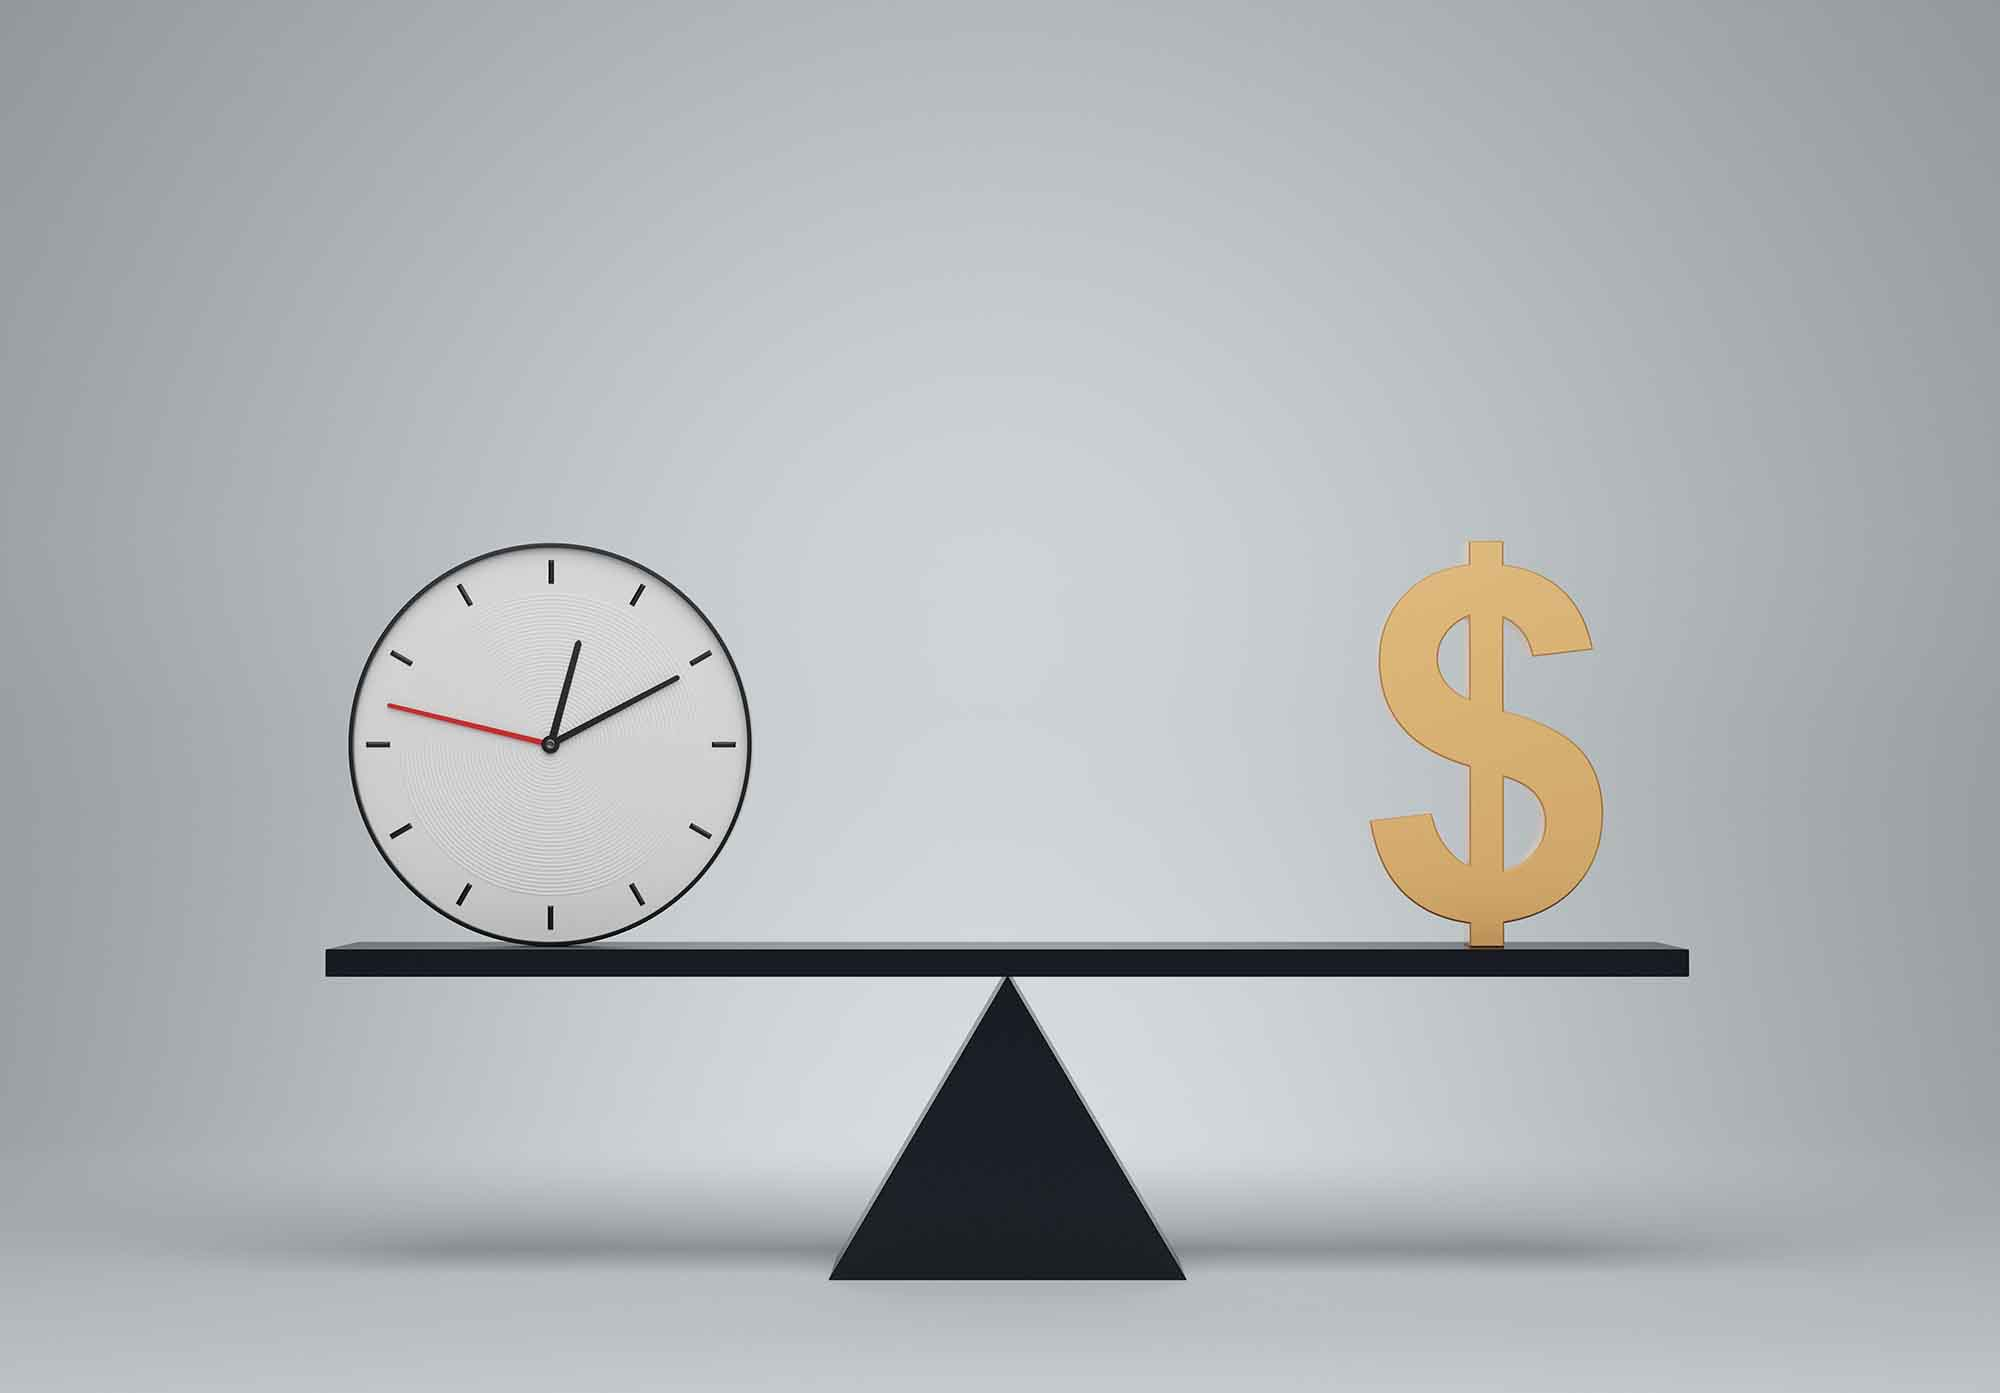 budget vs time